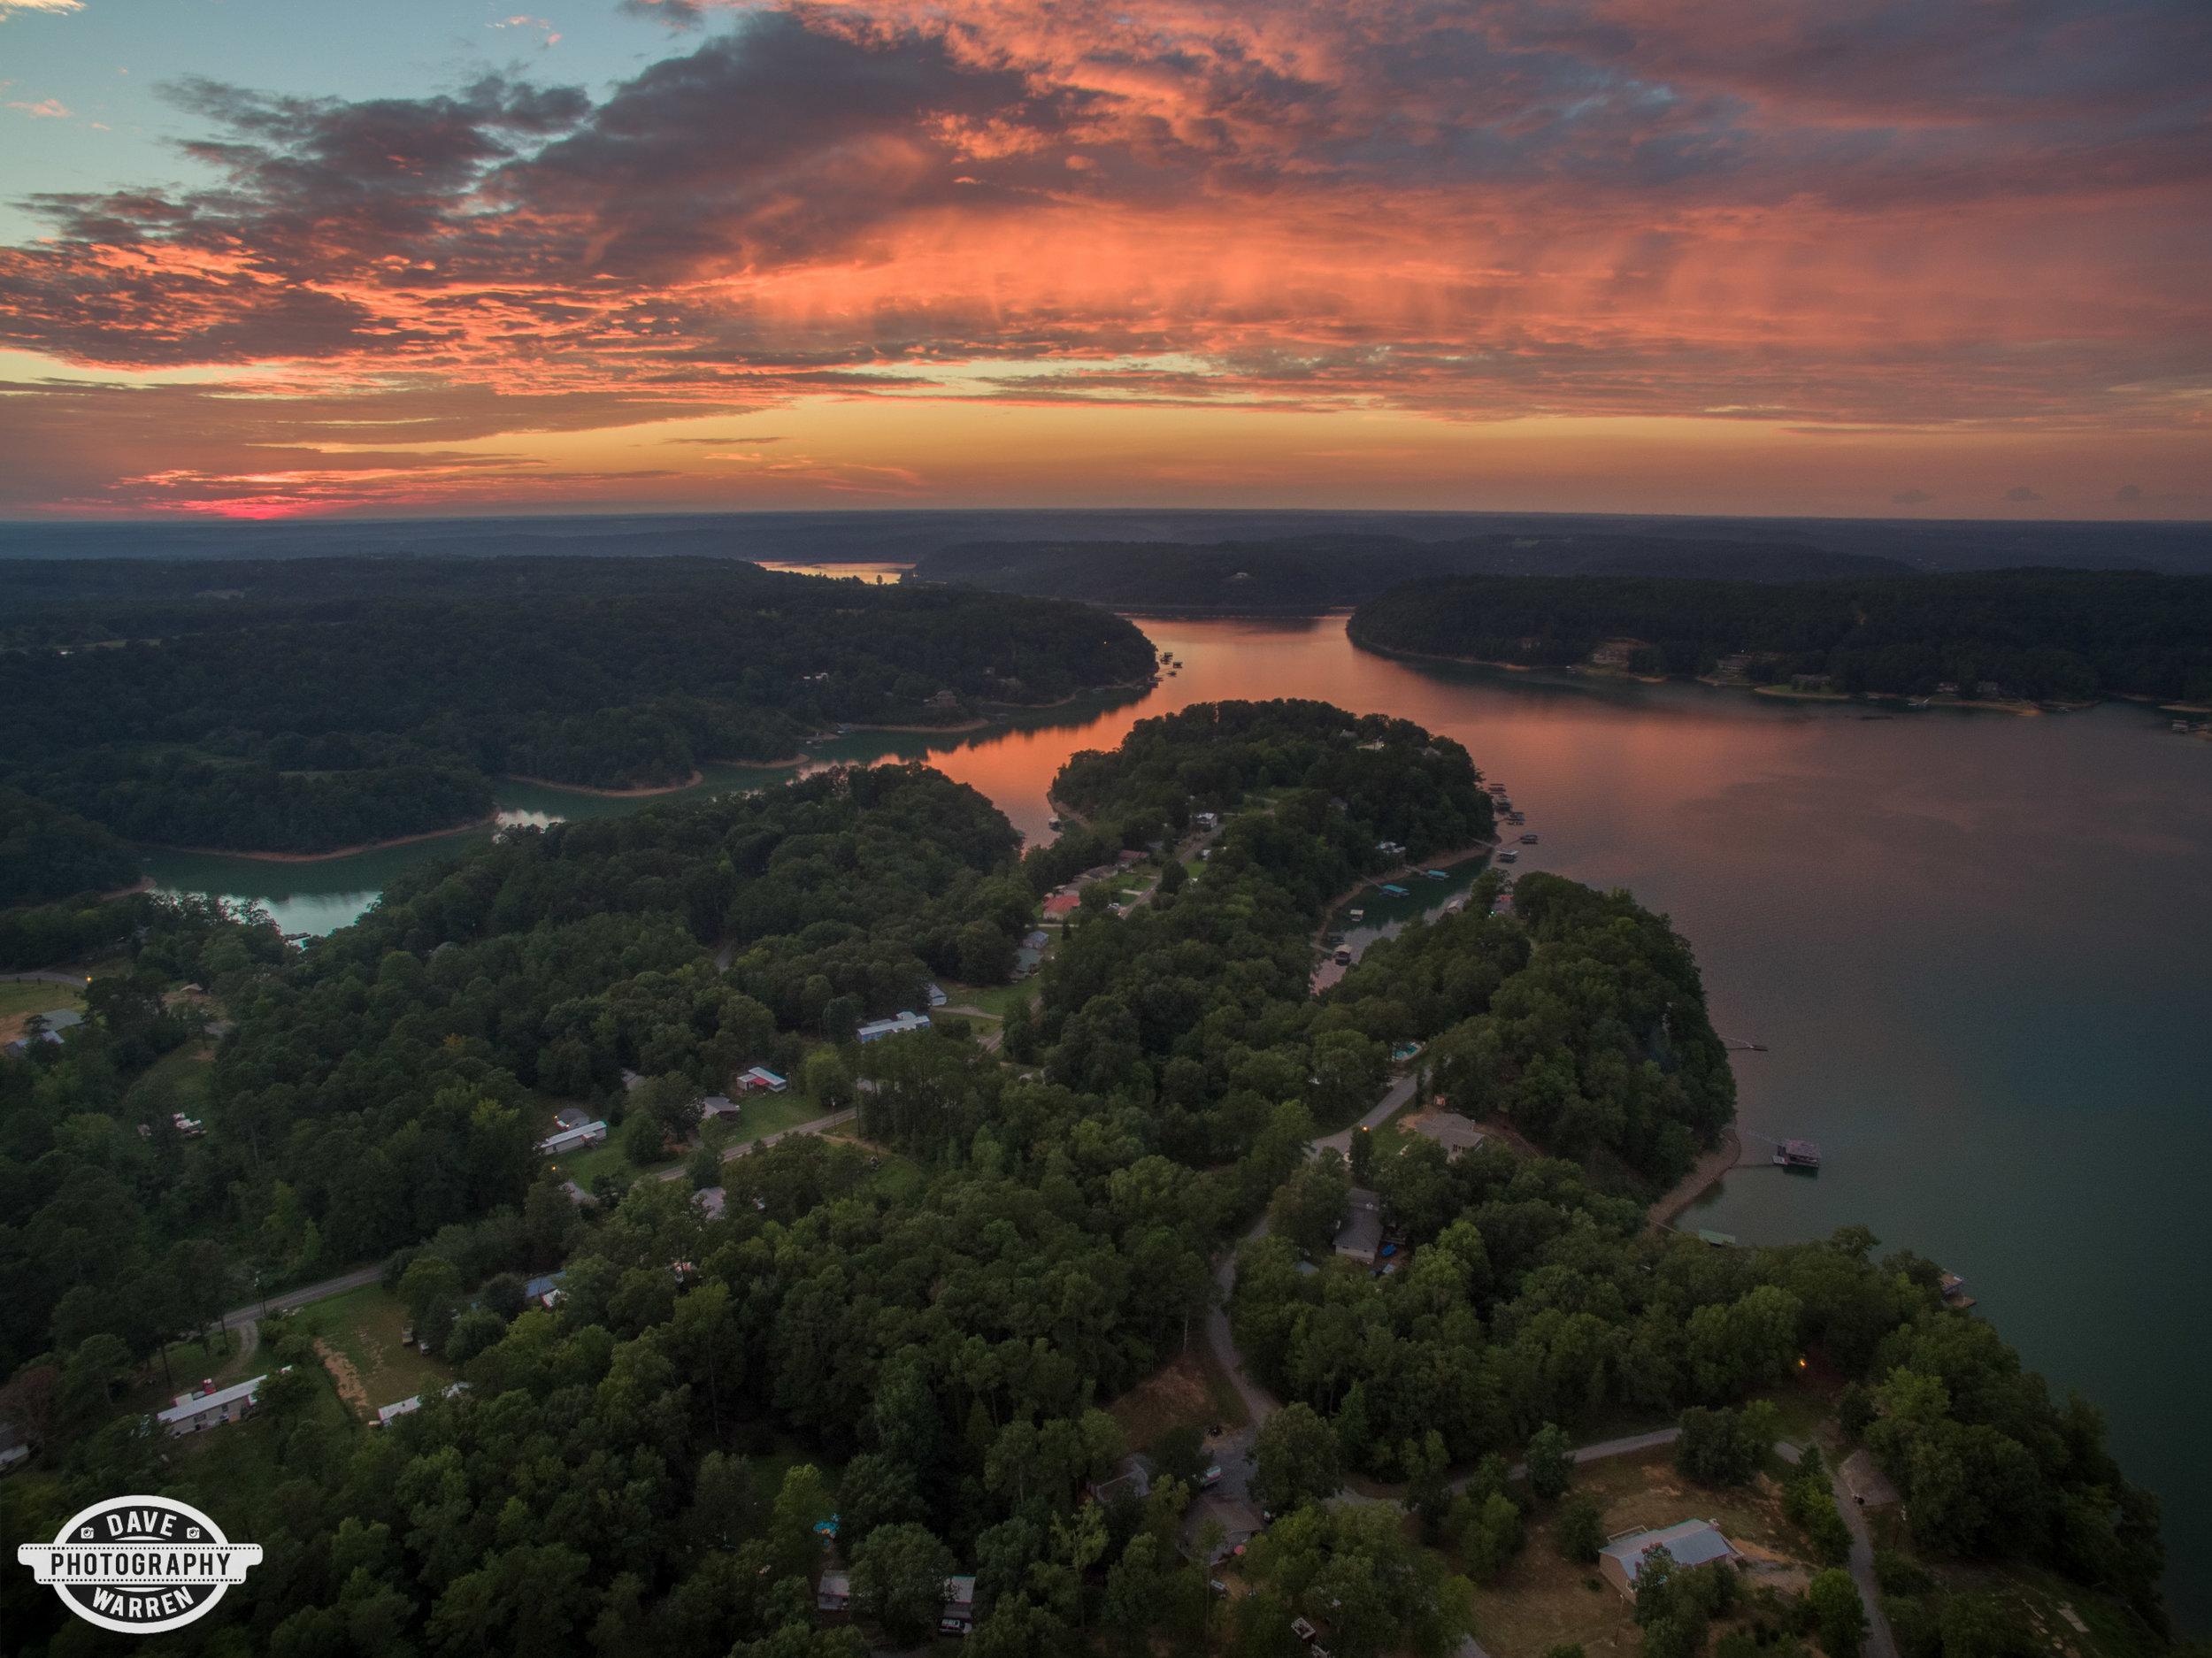 Sunset over Smith Lake